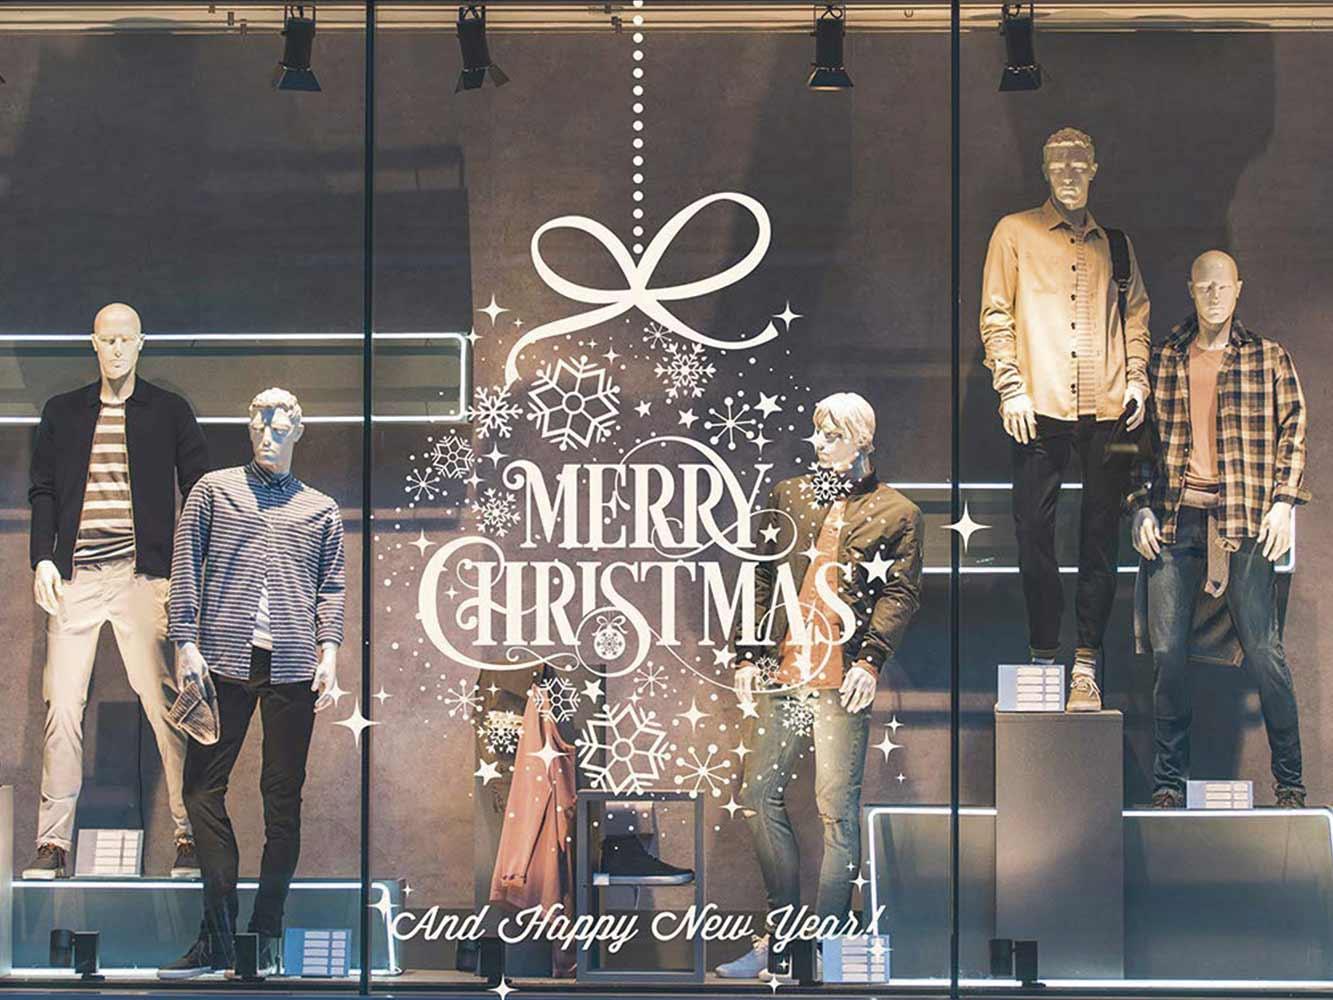 Vinilo Navidad Copos Nieve Merry Christmas | Carteles XXL - Impresión carteleria publicitaria